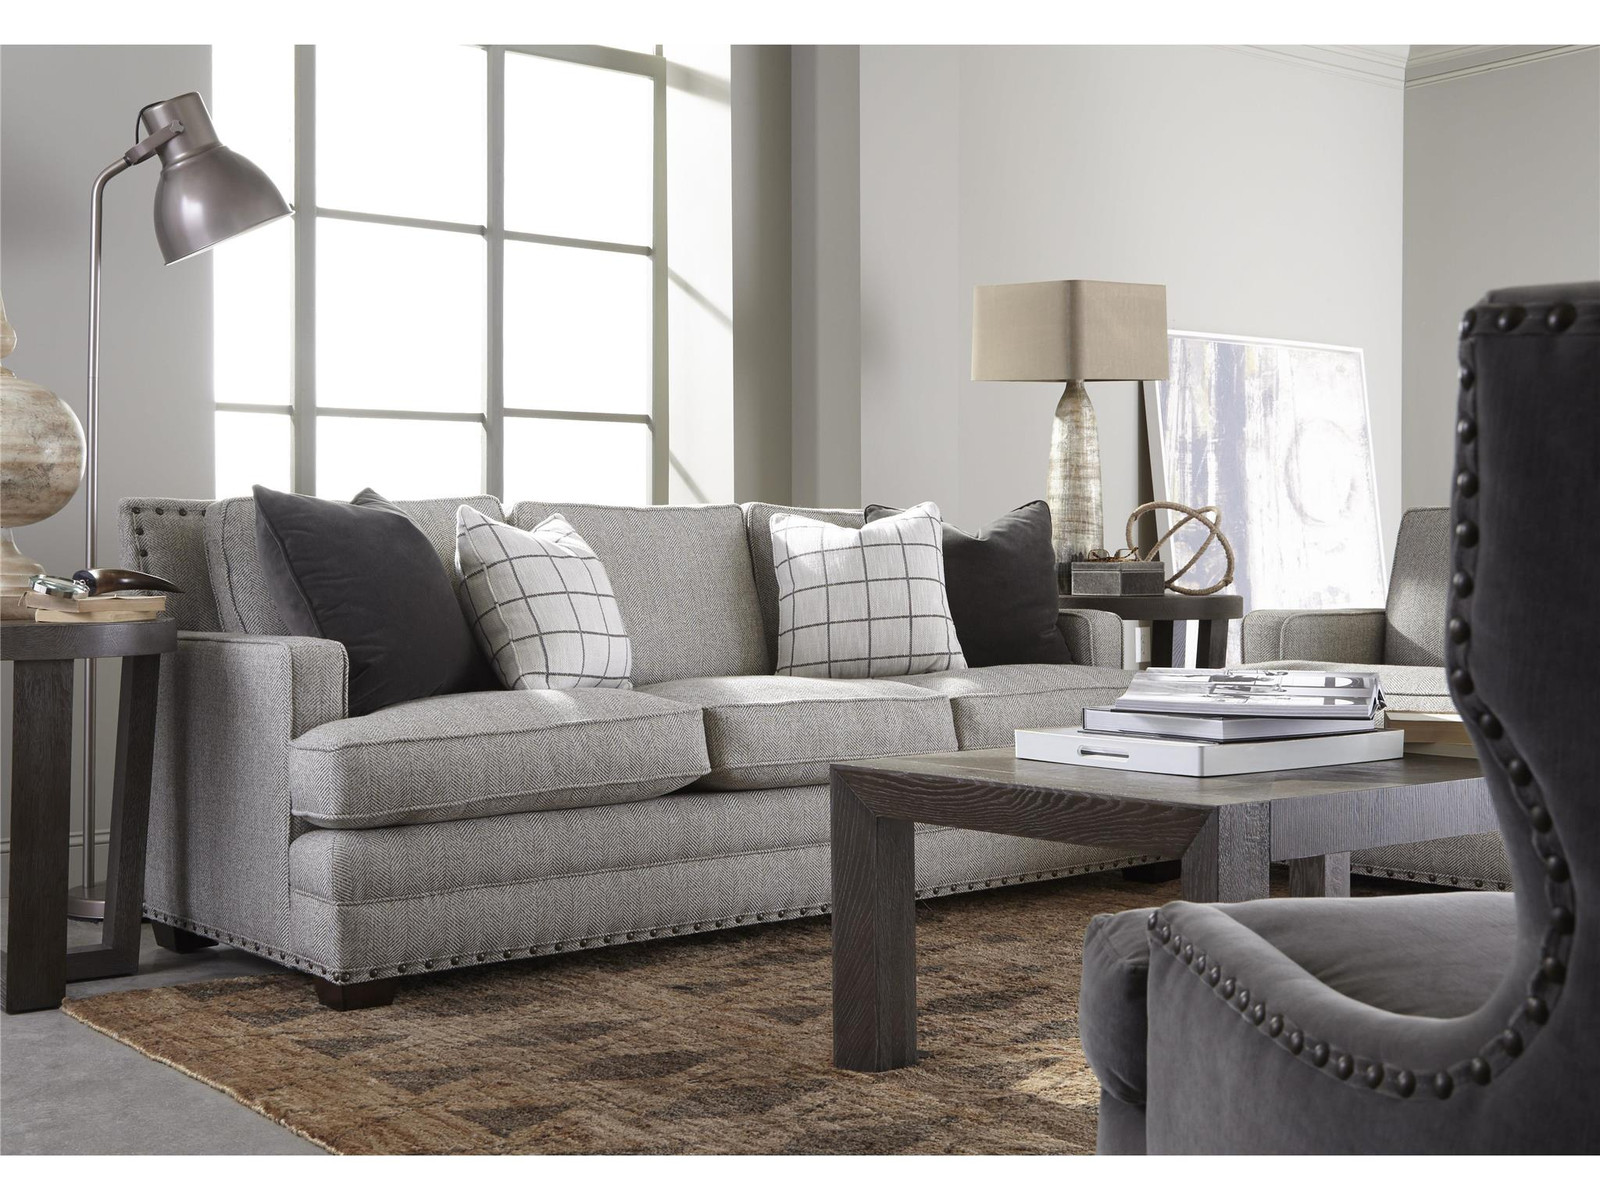 Woodland Creek Furniture Store in Tulsa, OK | Exquisite Furniture on warehouse direct, furniture direct, cars direct, appliance direct, object direct,